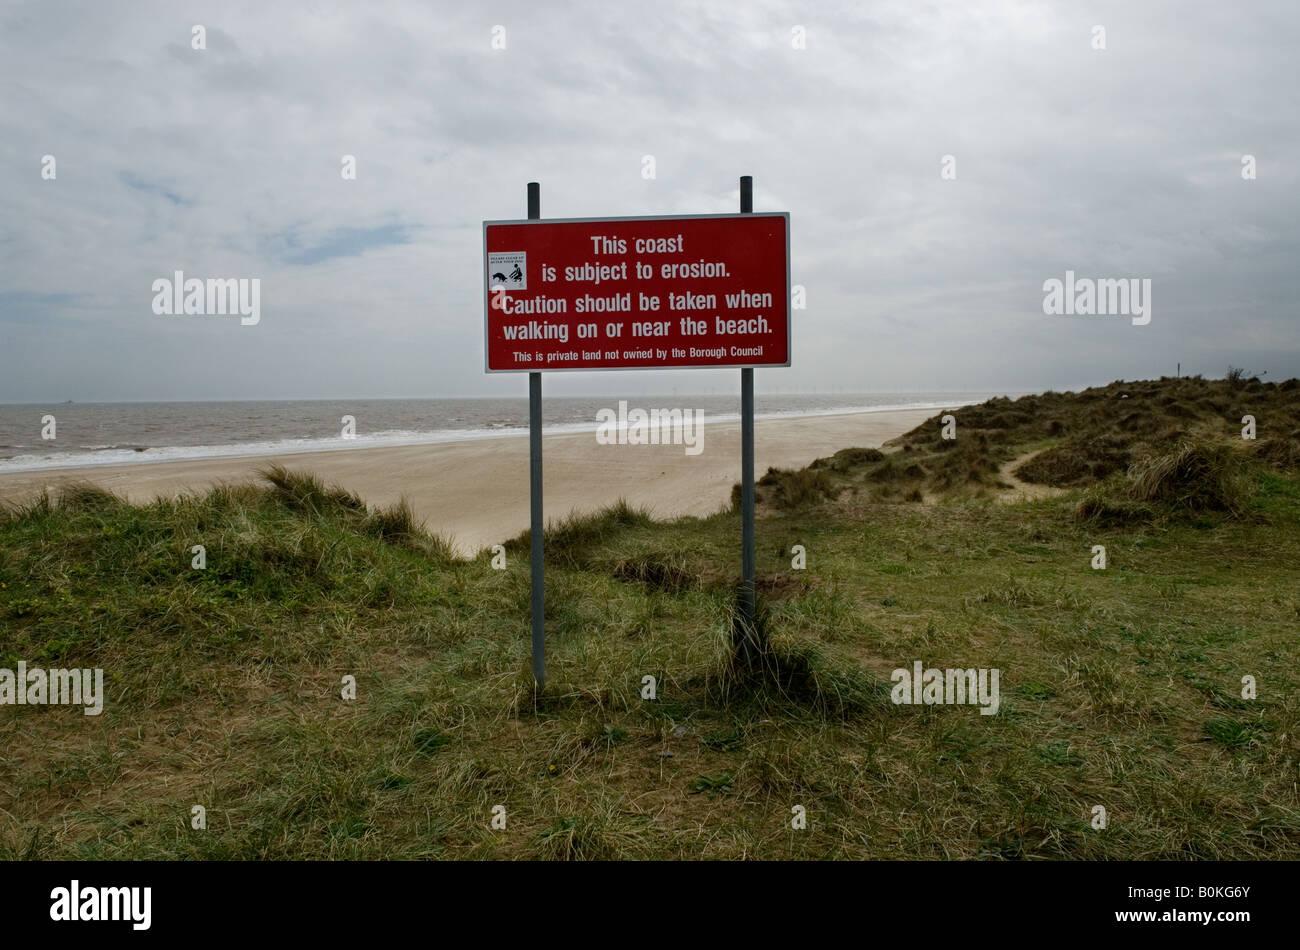 Großbritannien uk England Küstenerosion Erosion Strand Meer globale Erwärmung Winterton auf Sanddünen Stockbild